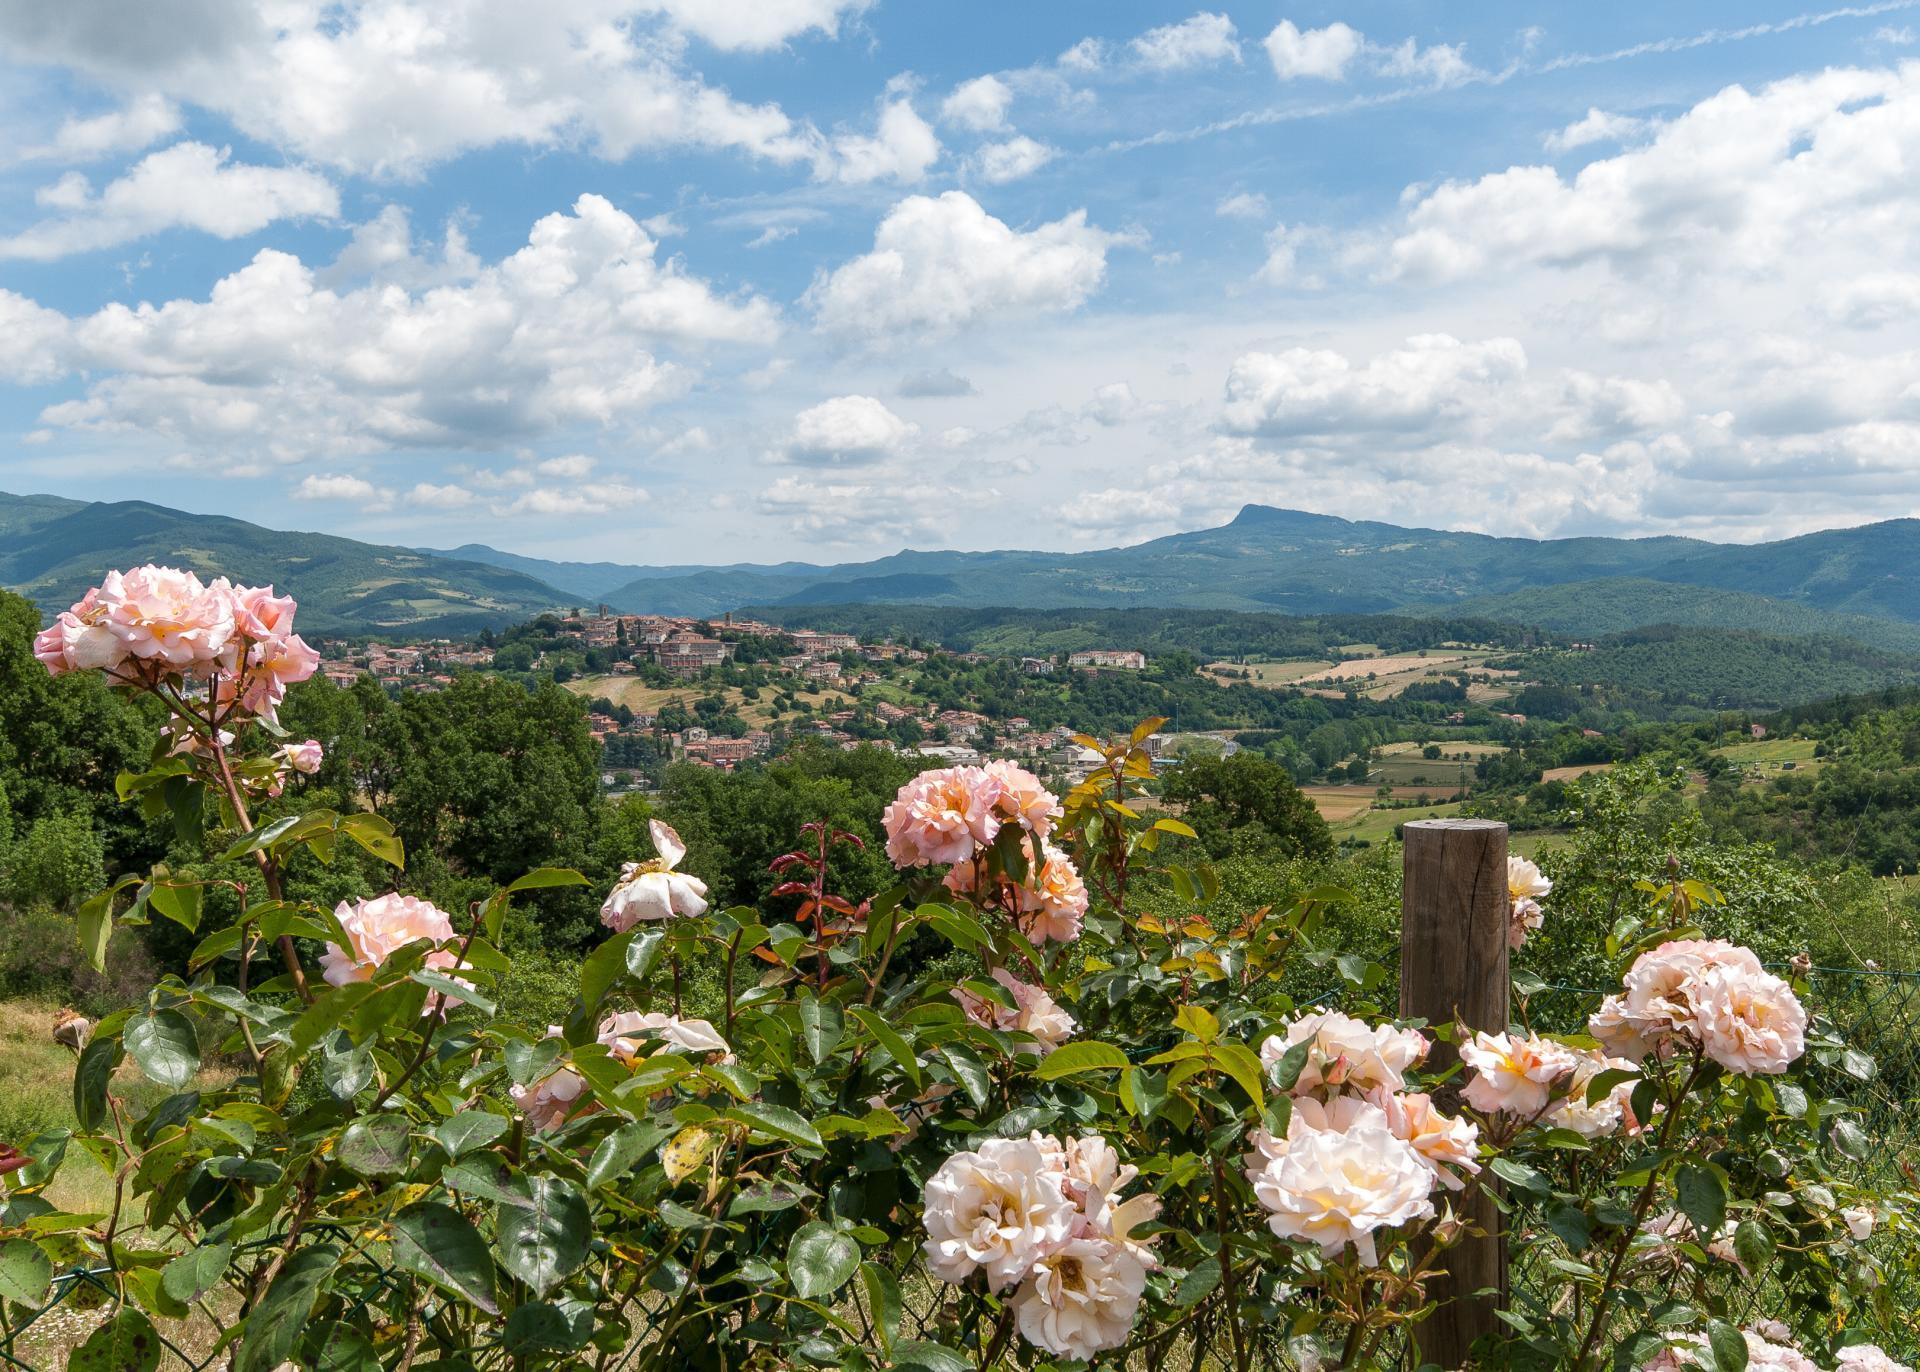 Villa Views, Il Casentino, Poppi, Tuscany.